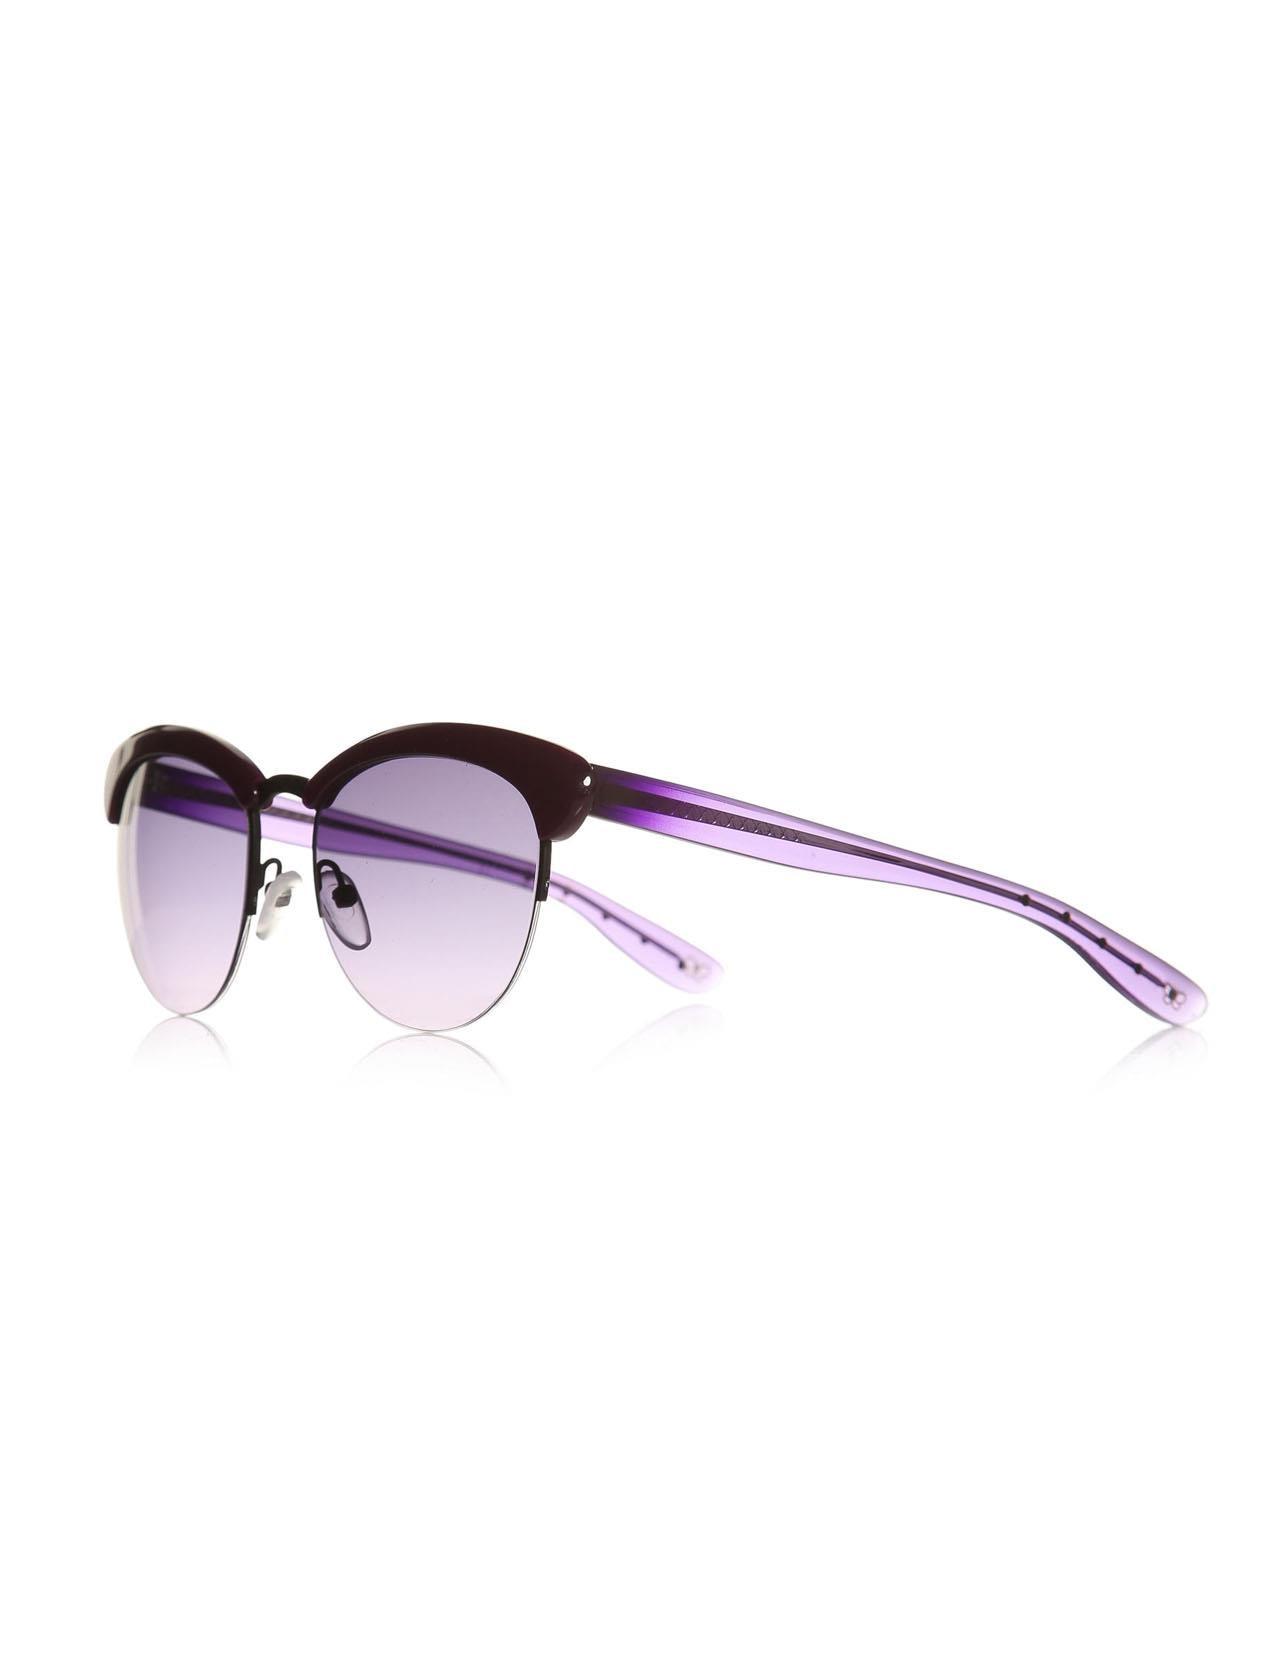 Women's sunglasses b.v 199/s k82 52 tb clubmaster purple organic round panto 52-18-140 bottega veneta